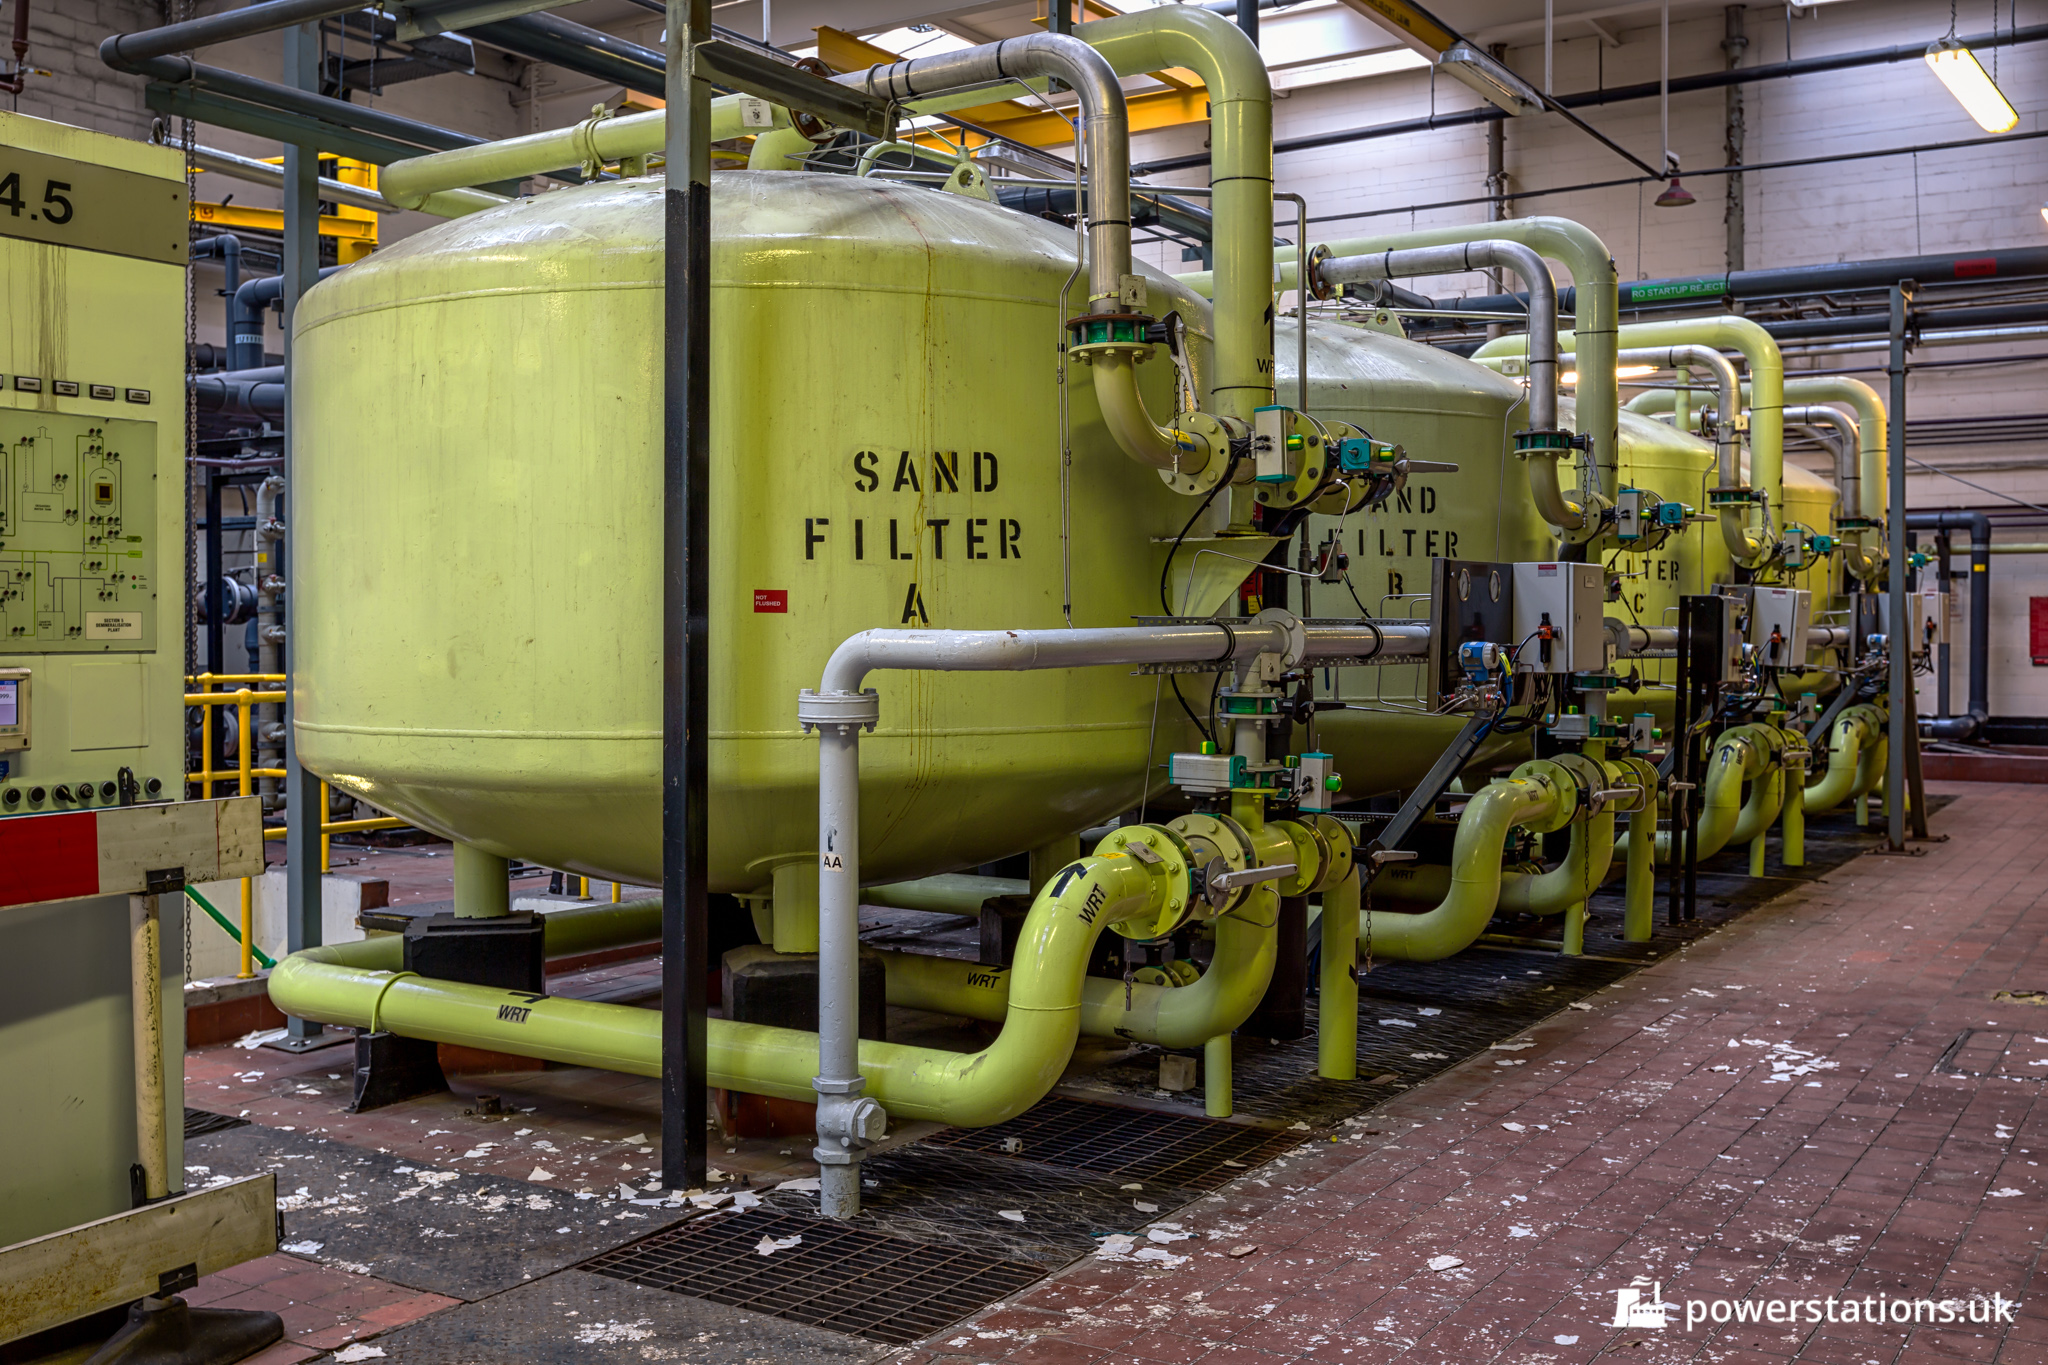 Ferrybridge C Power Station  U2013 Water Treatment Plant And Pump House  U2013 Power Stations Of The Uk